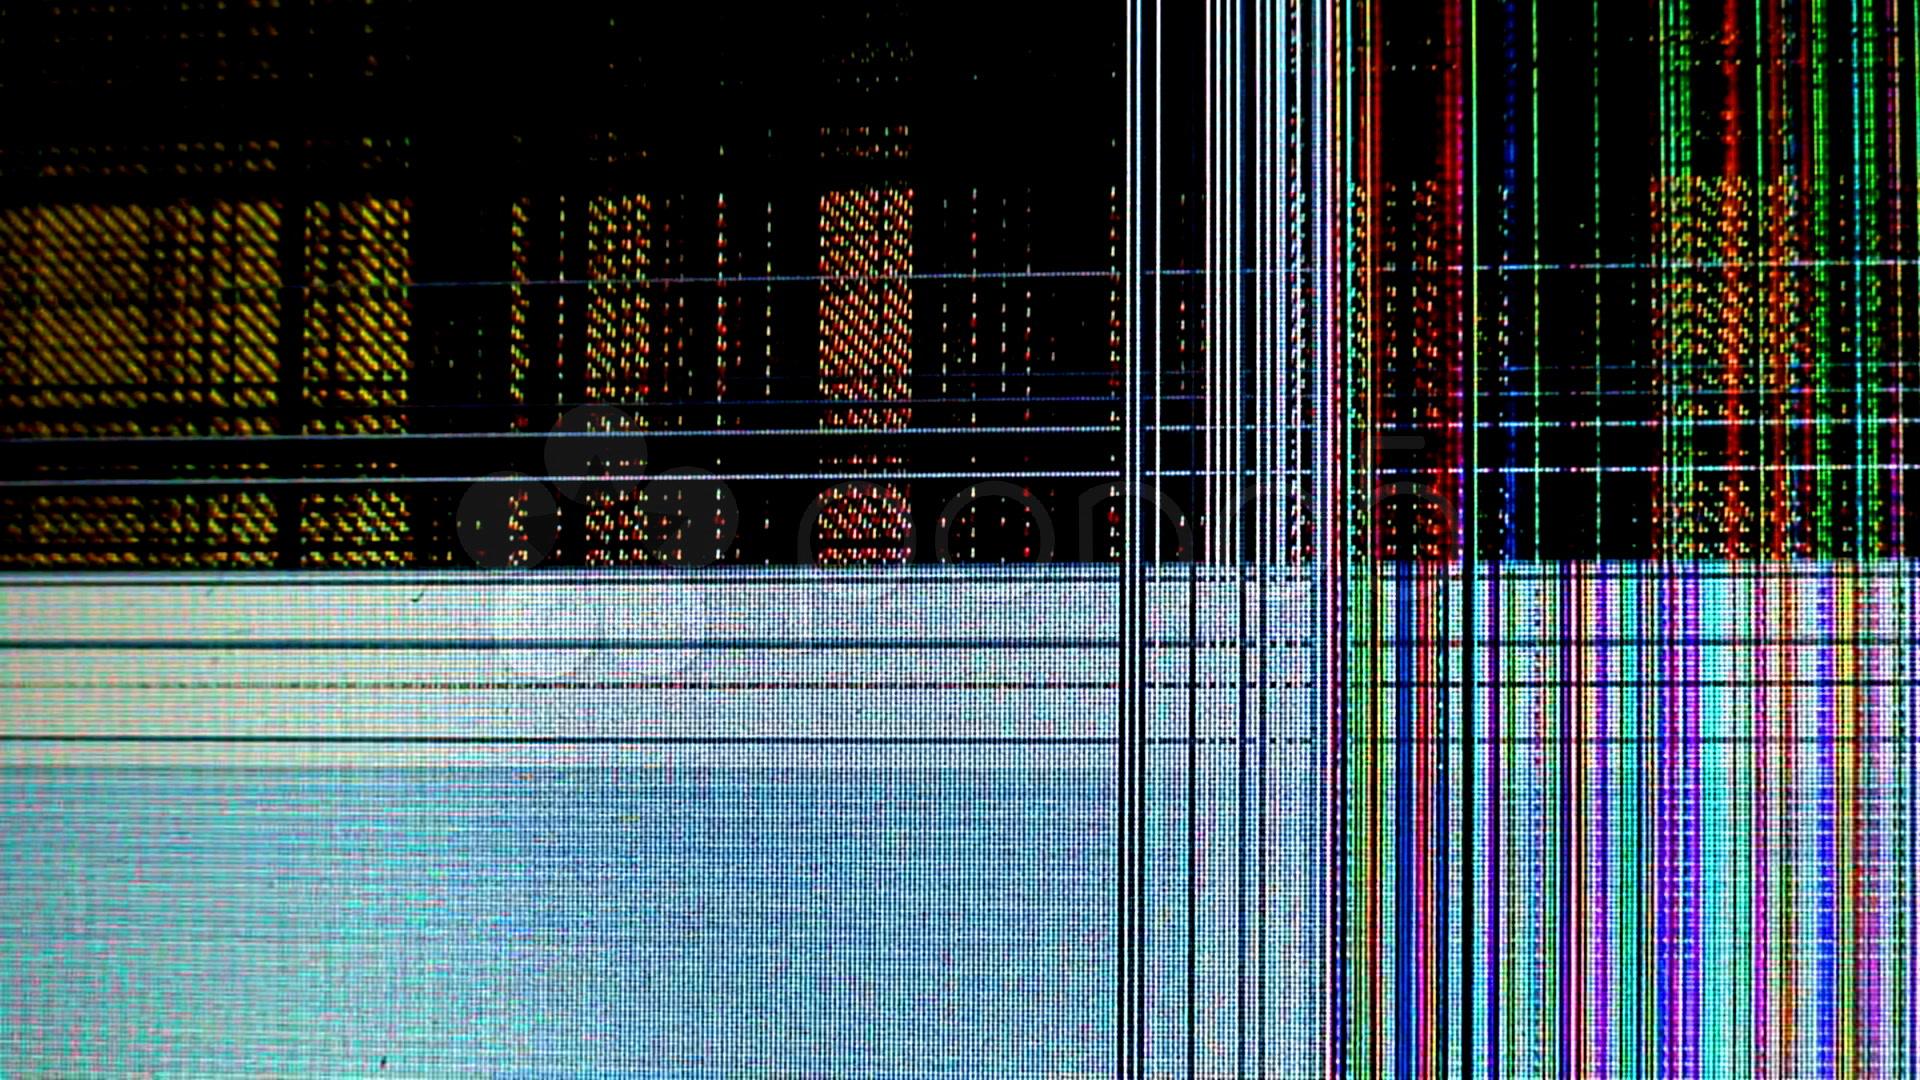 Broken Cracked Lcd Screen Stock Video 591901 HD Footage 1920x1080